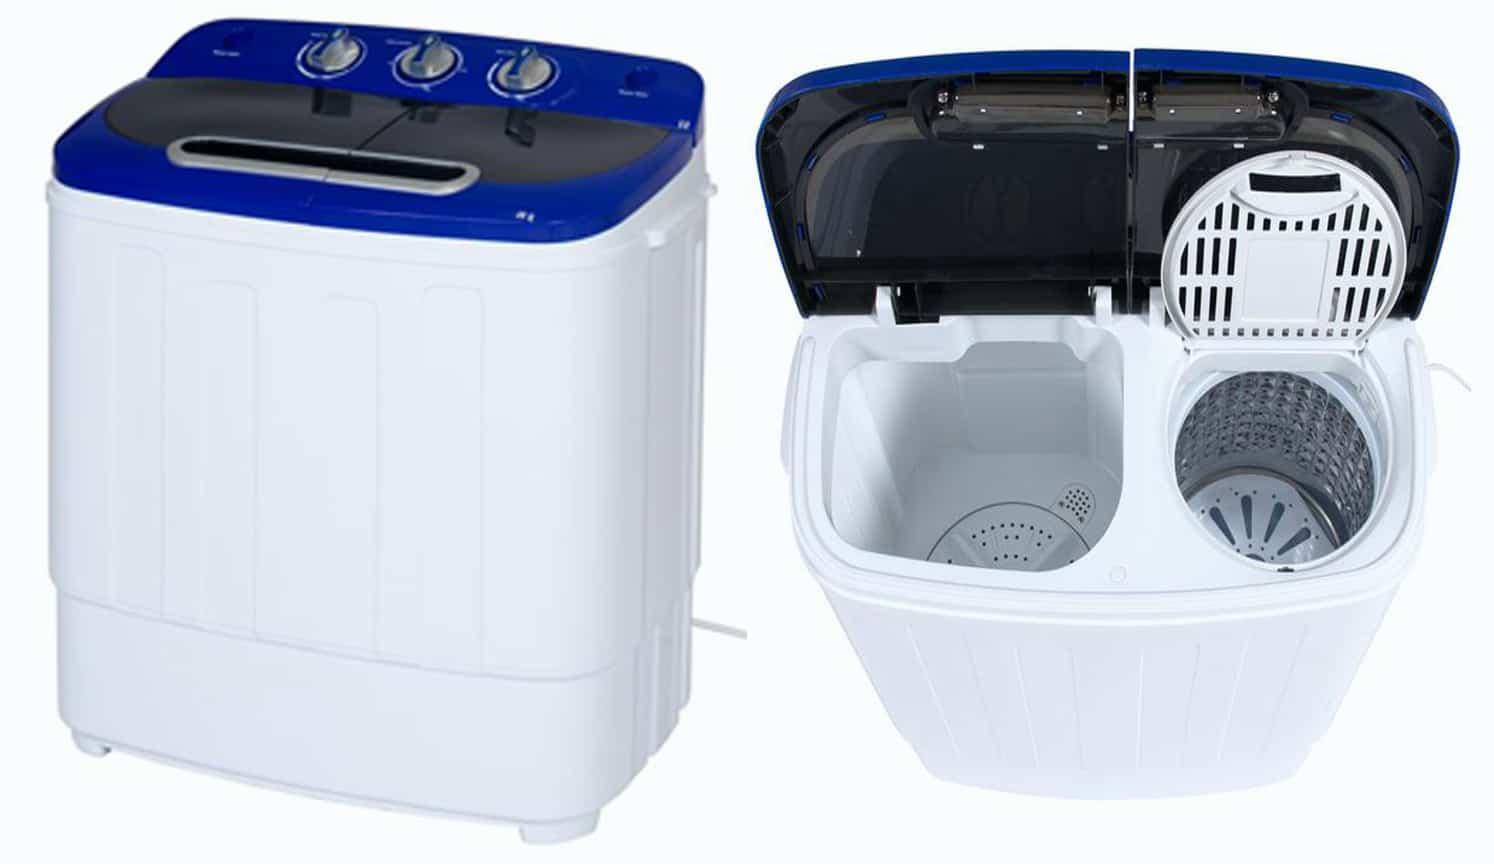 Portable Mini Washing Machine as the first related product of the Best Portable Washing Machine